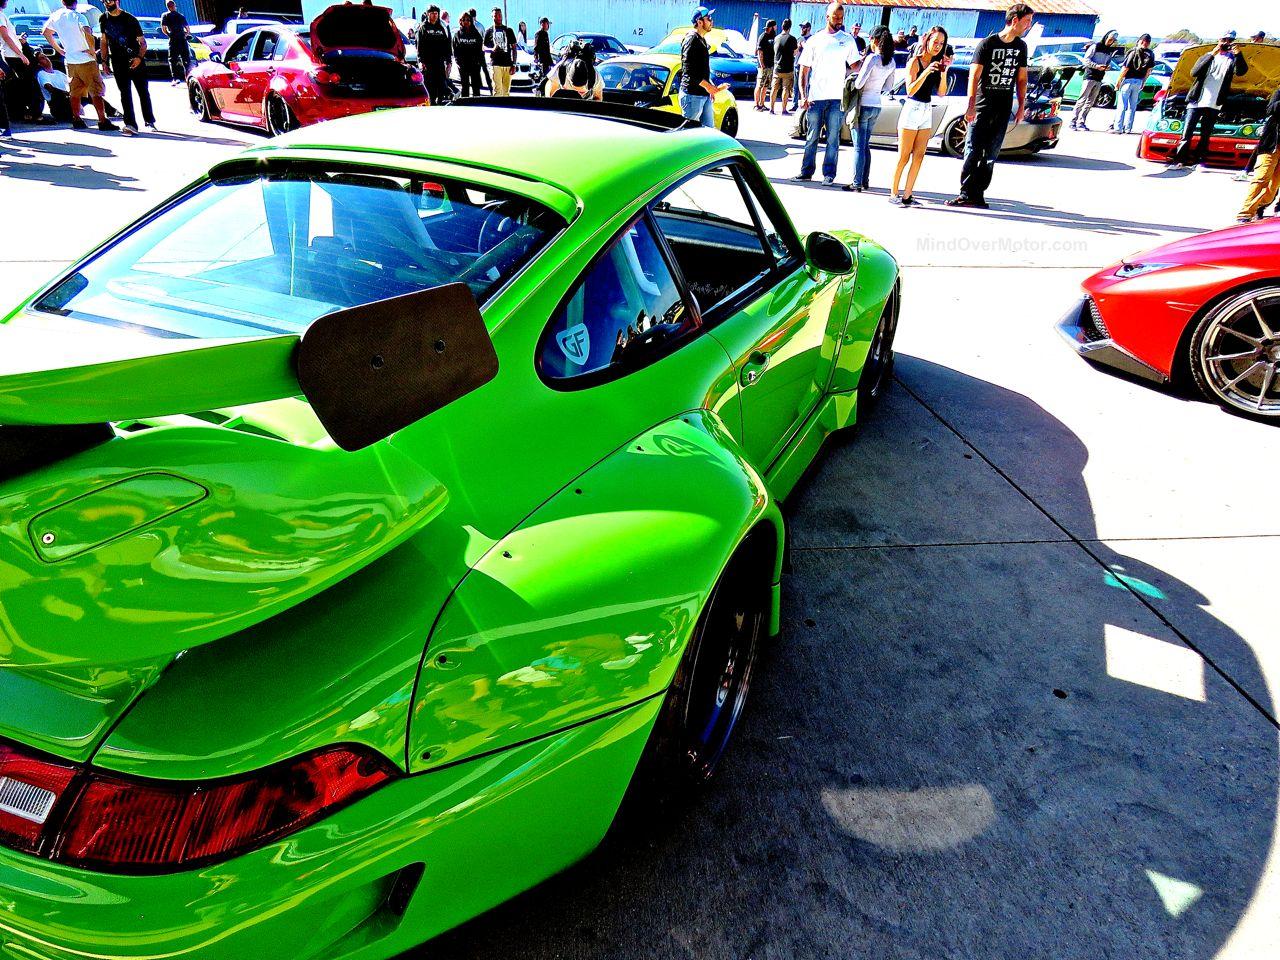 RWB Porsche 993 Philly 10